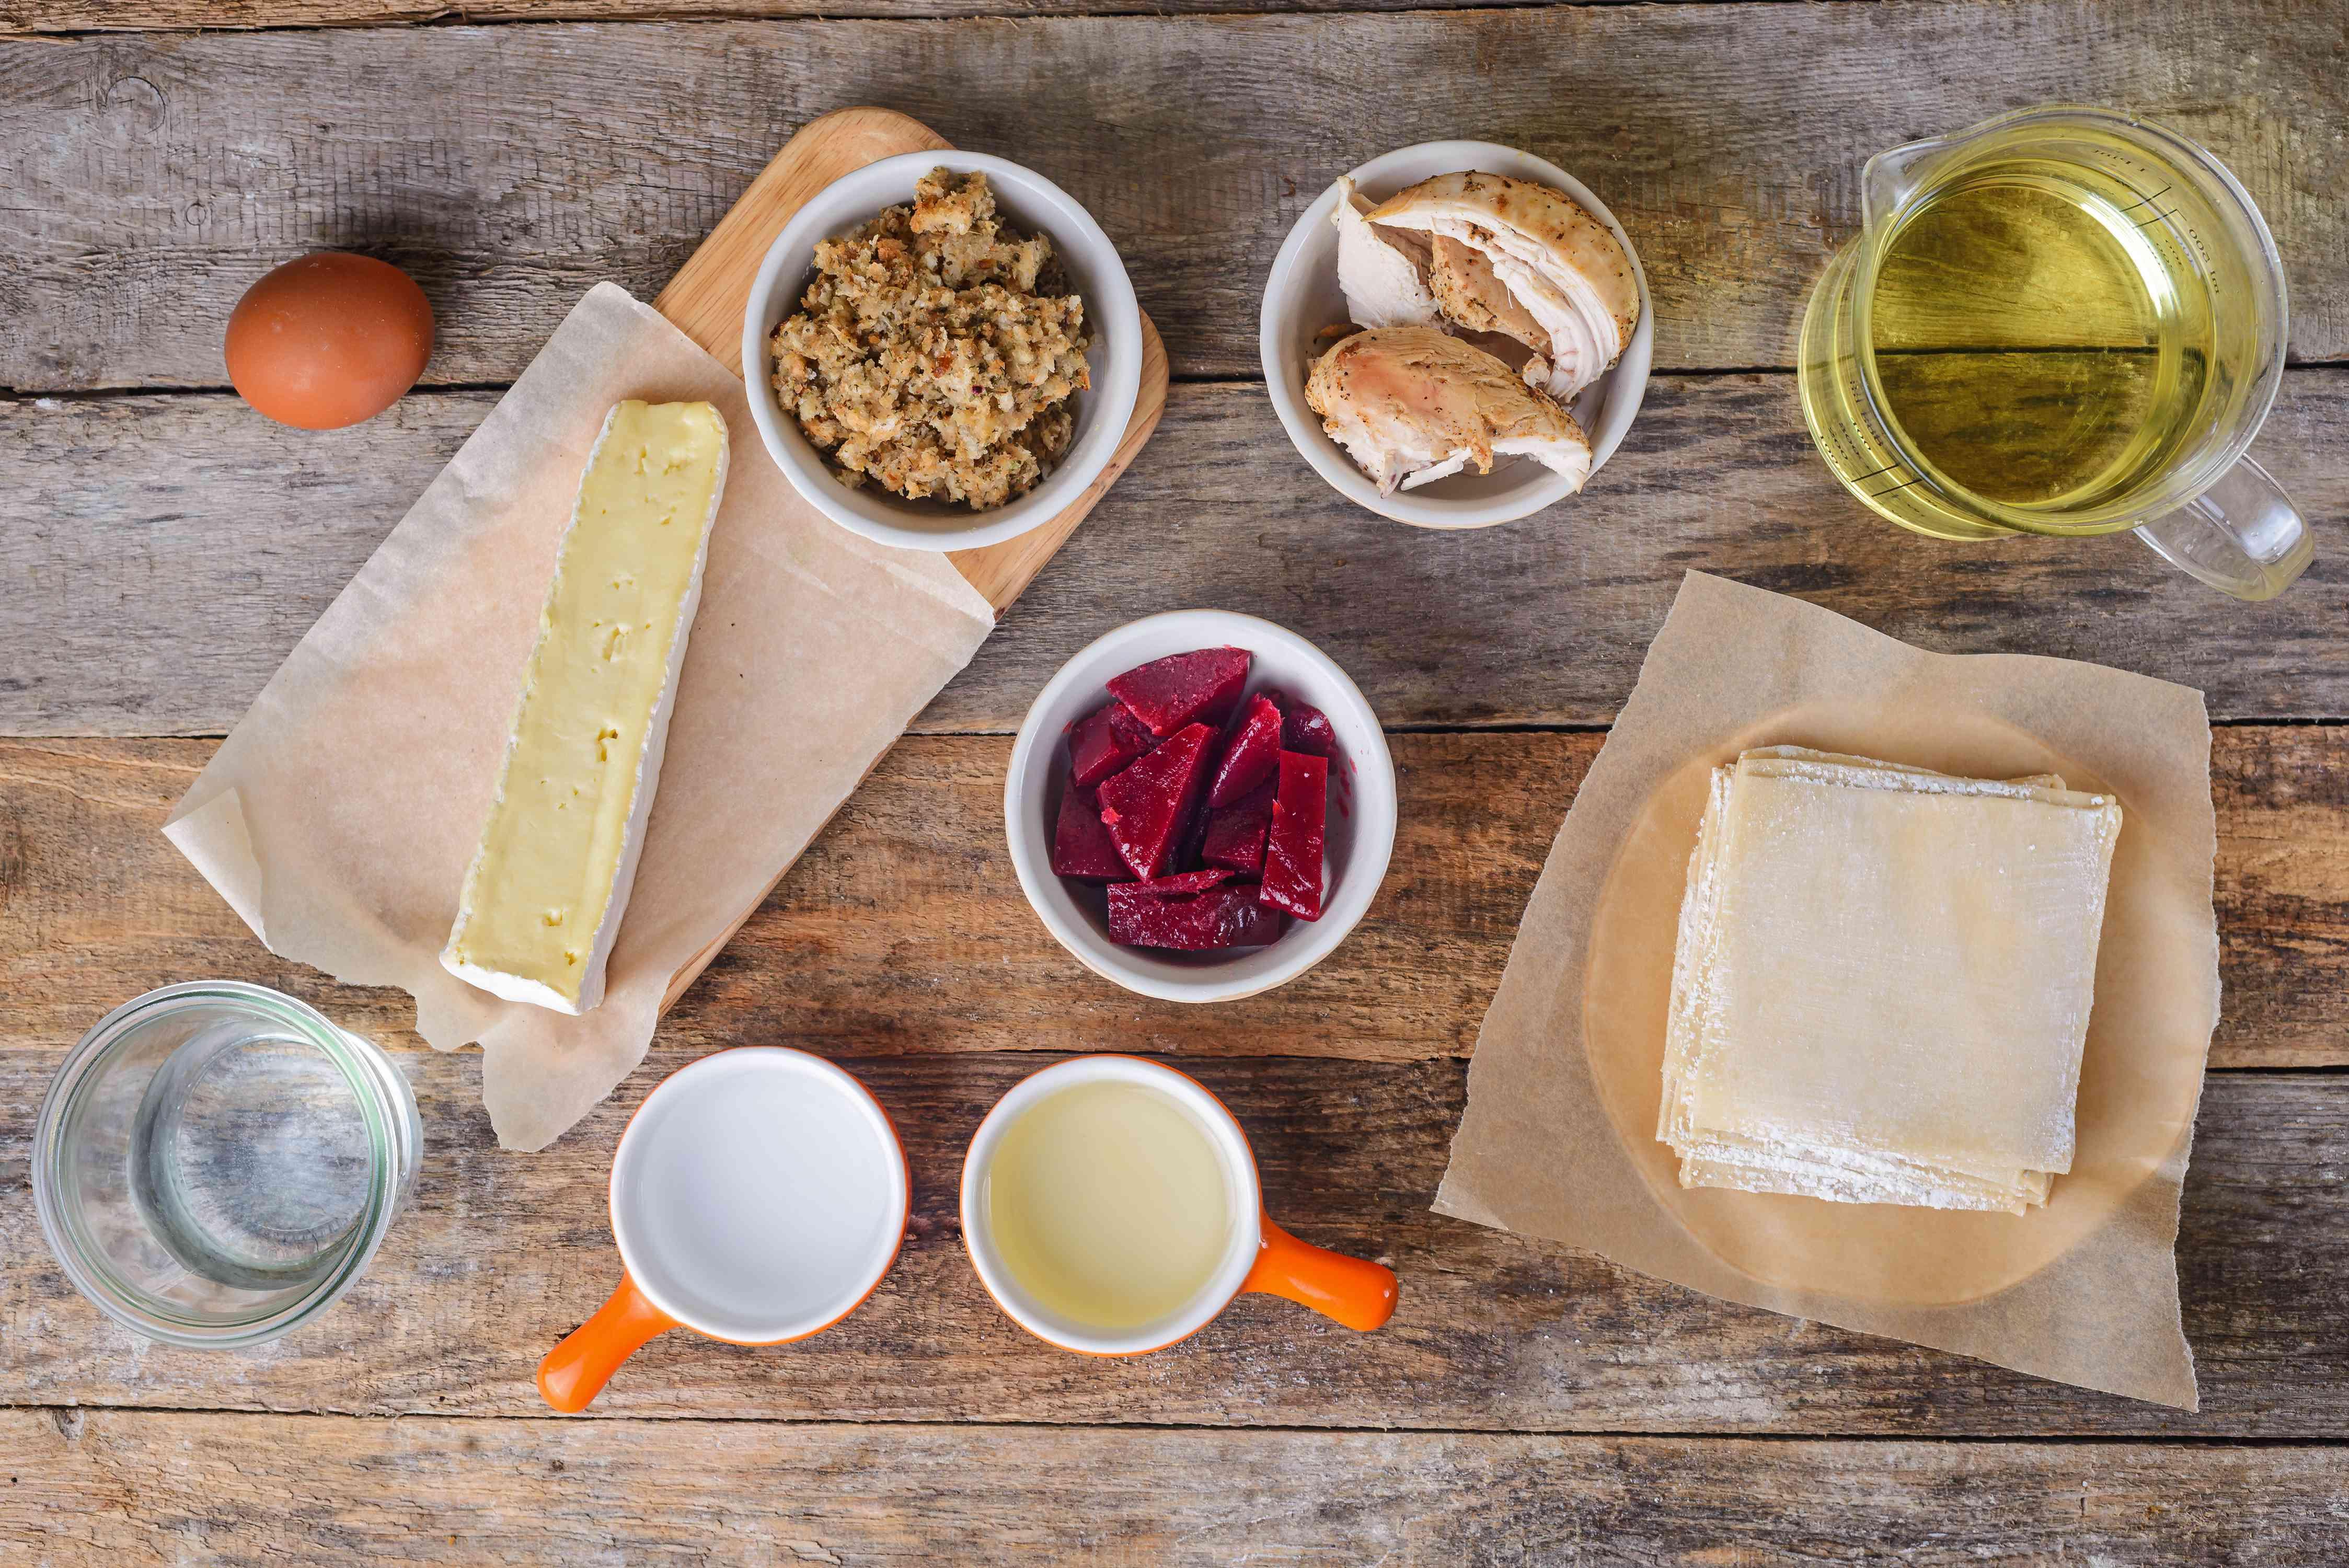 Ingredients for Thanksgiving egg rolls